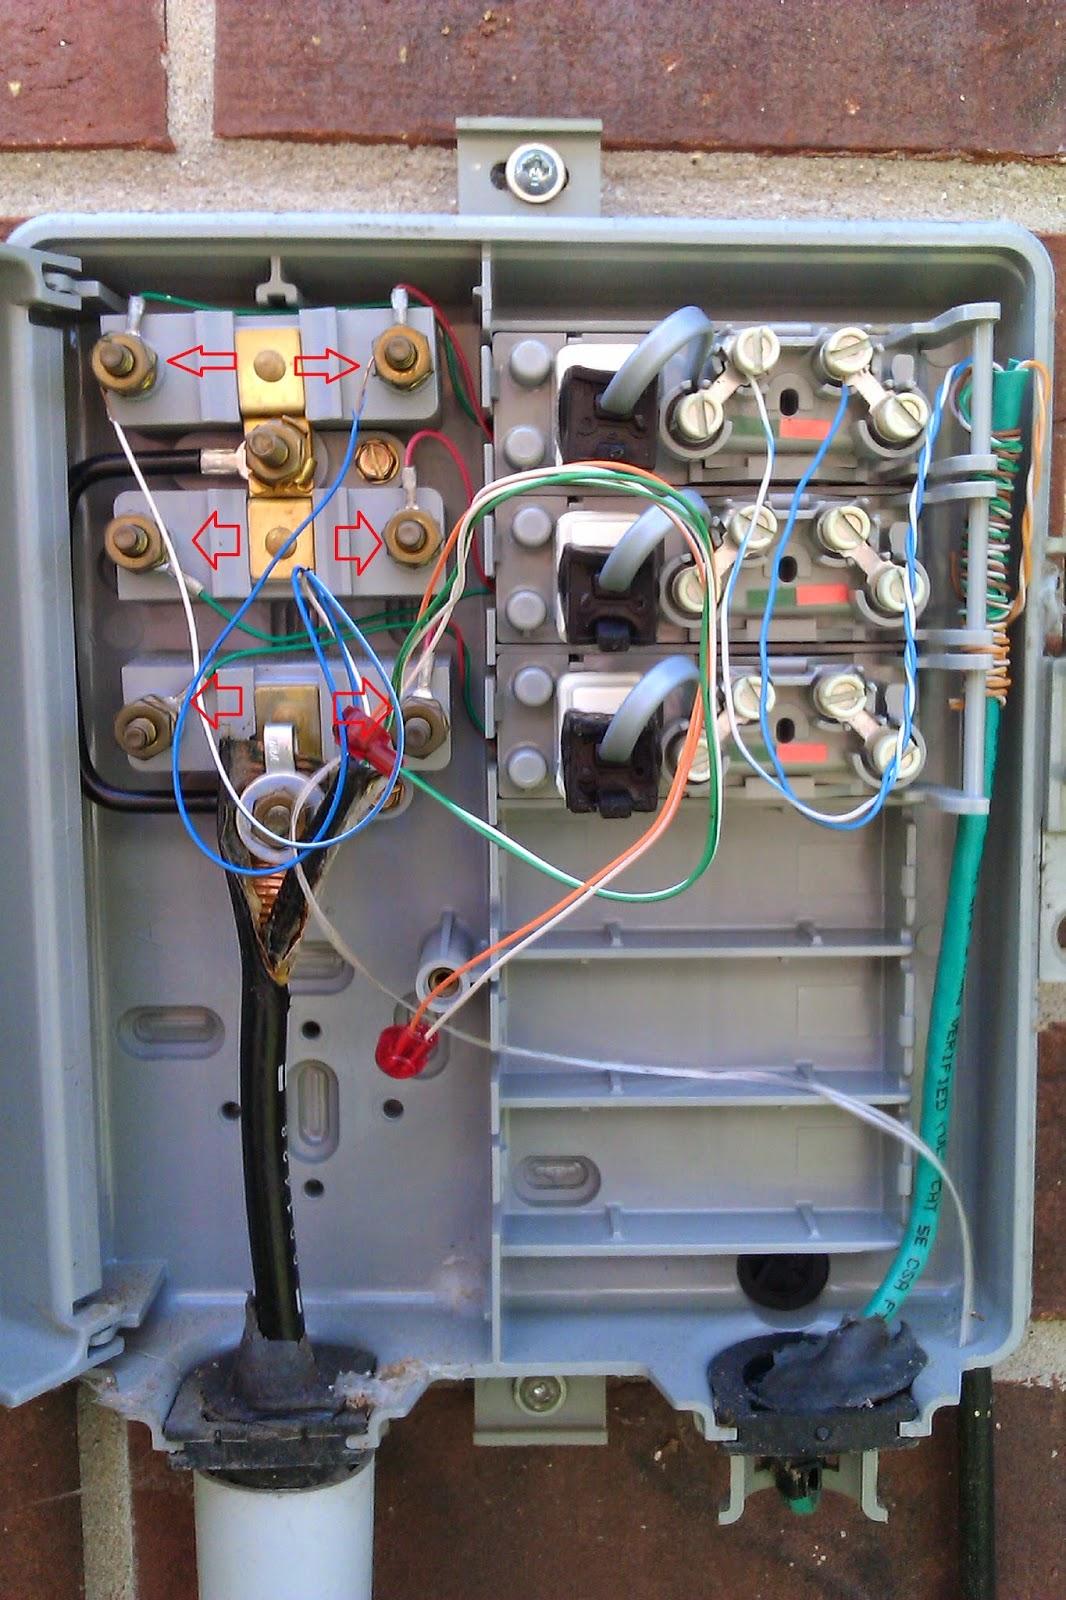 medium resolution of qwest nid wiring guide wiring diagram forward demarcation box outside phone box wiring also phone nid